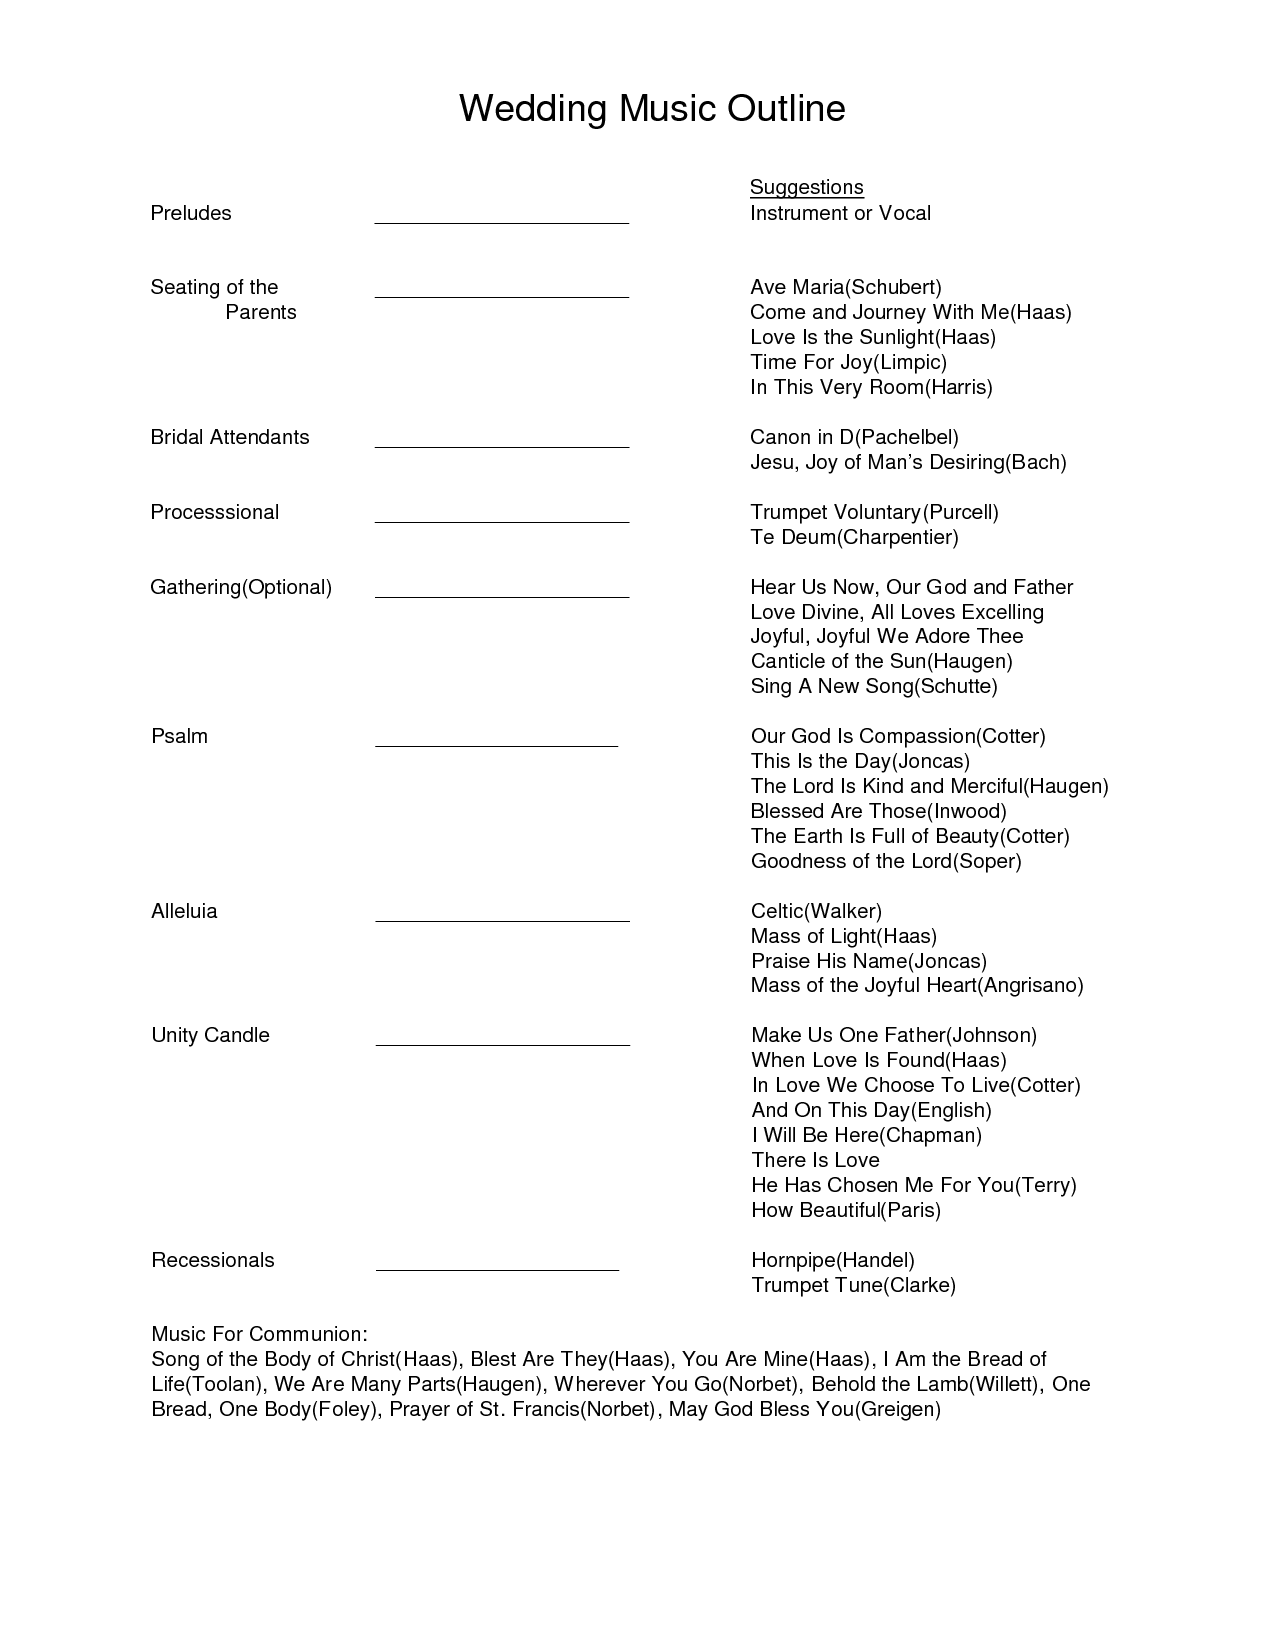 Wedding Music Outline Document Sample Wedding Music